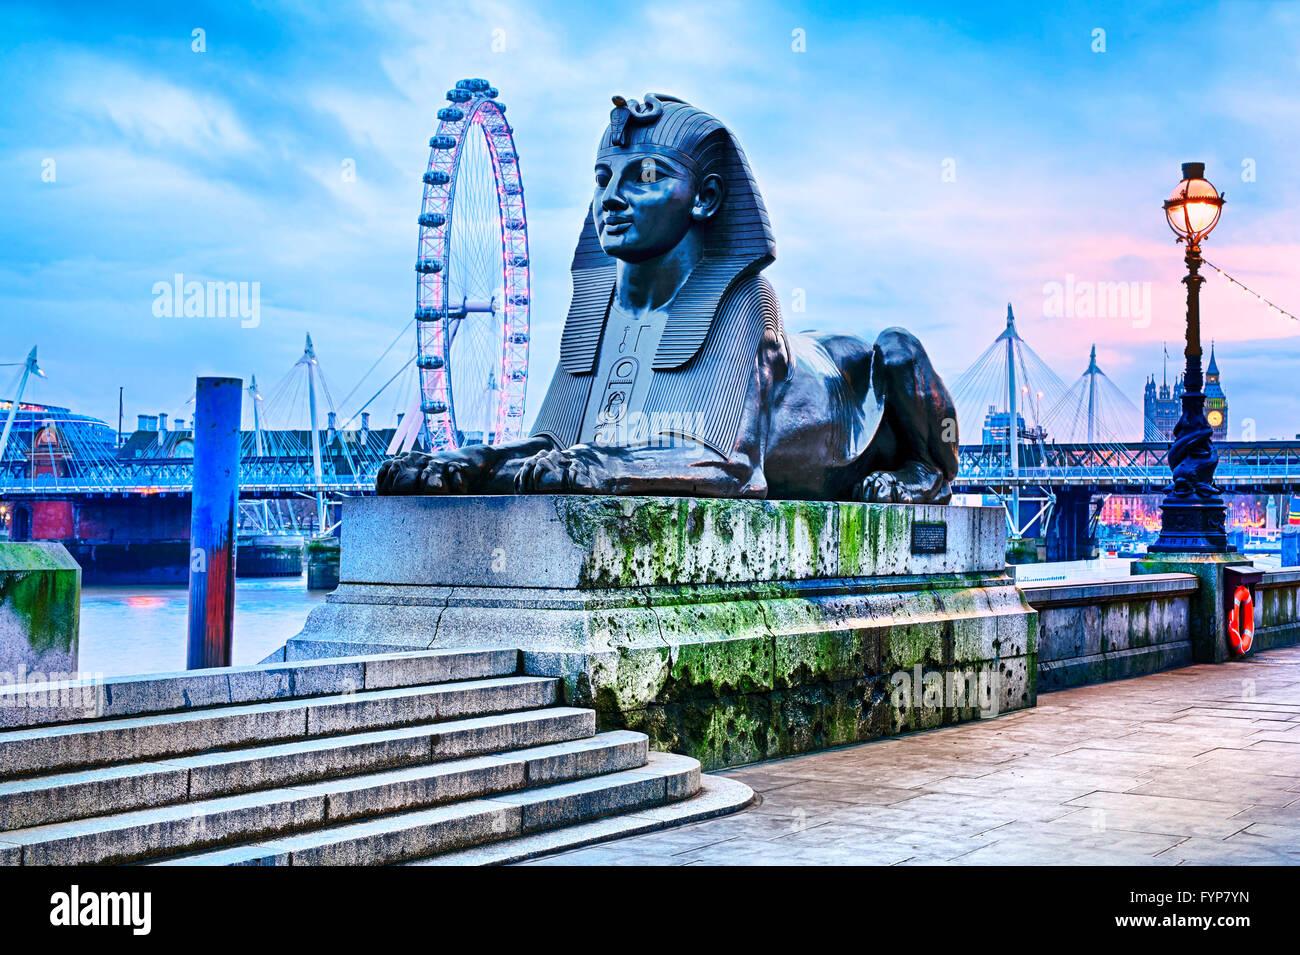 sphinx embankment london on river thames - Stock Image